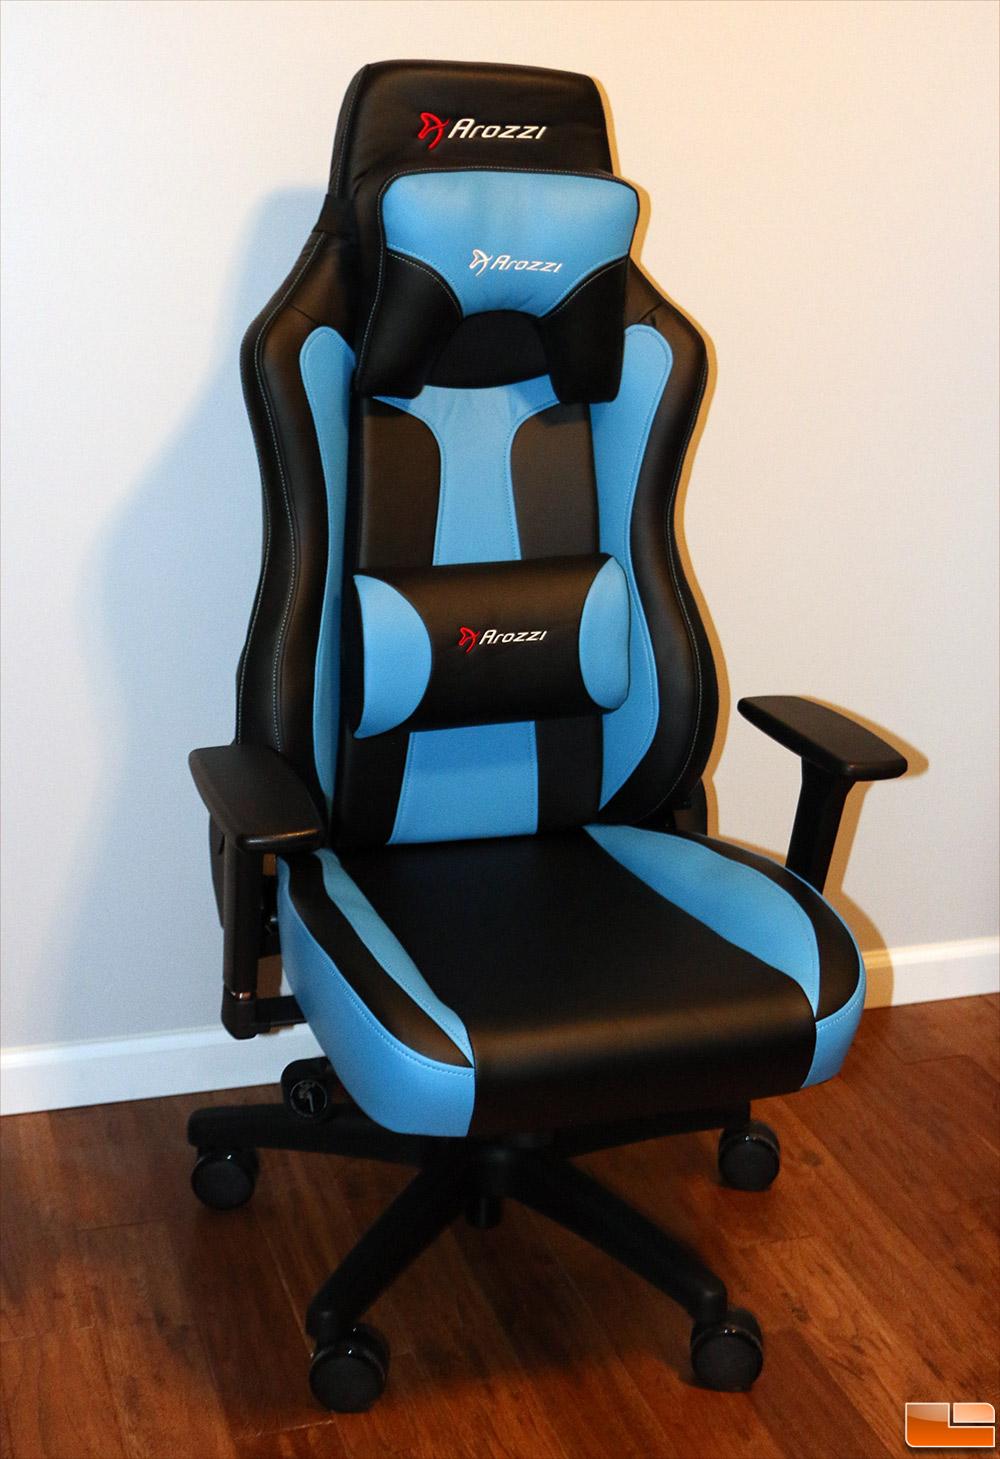 gaming chair review evenflo quatore 4 in 1 high deep lake teal arozzi vernazza series legit reviews